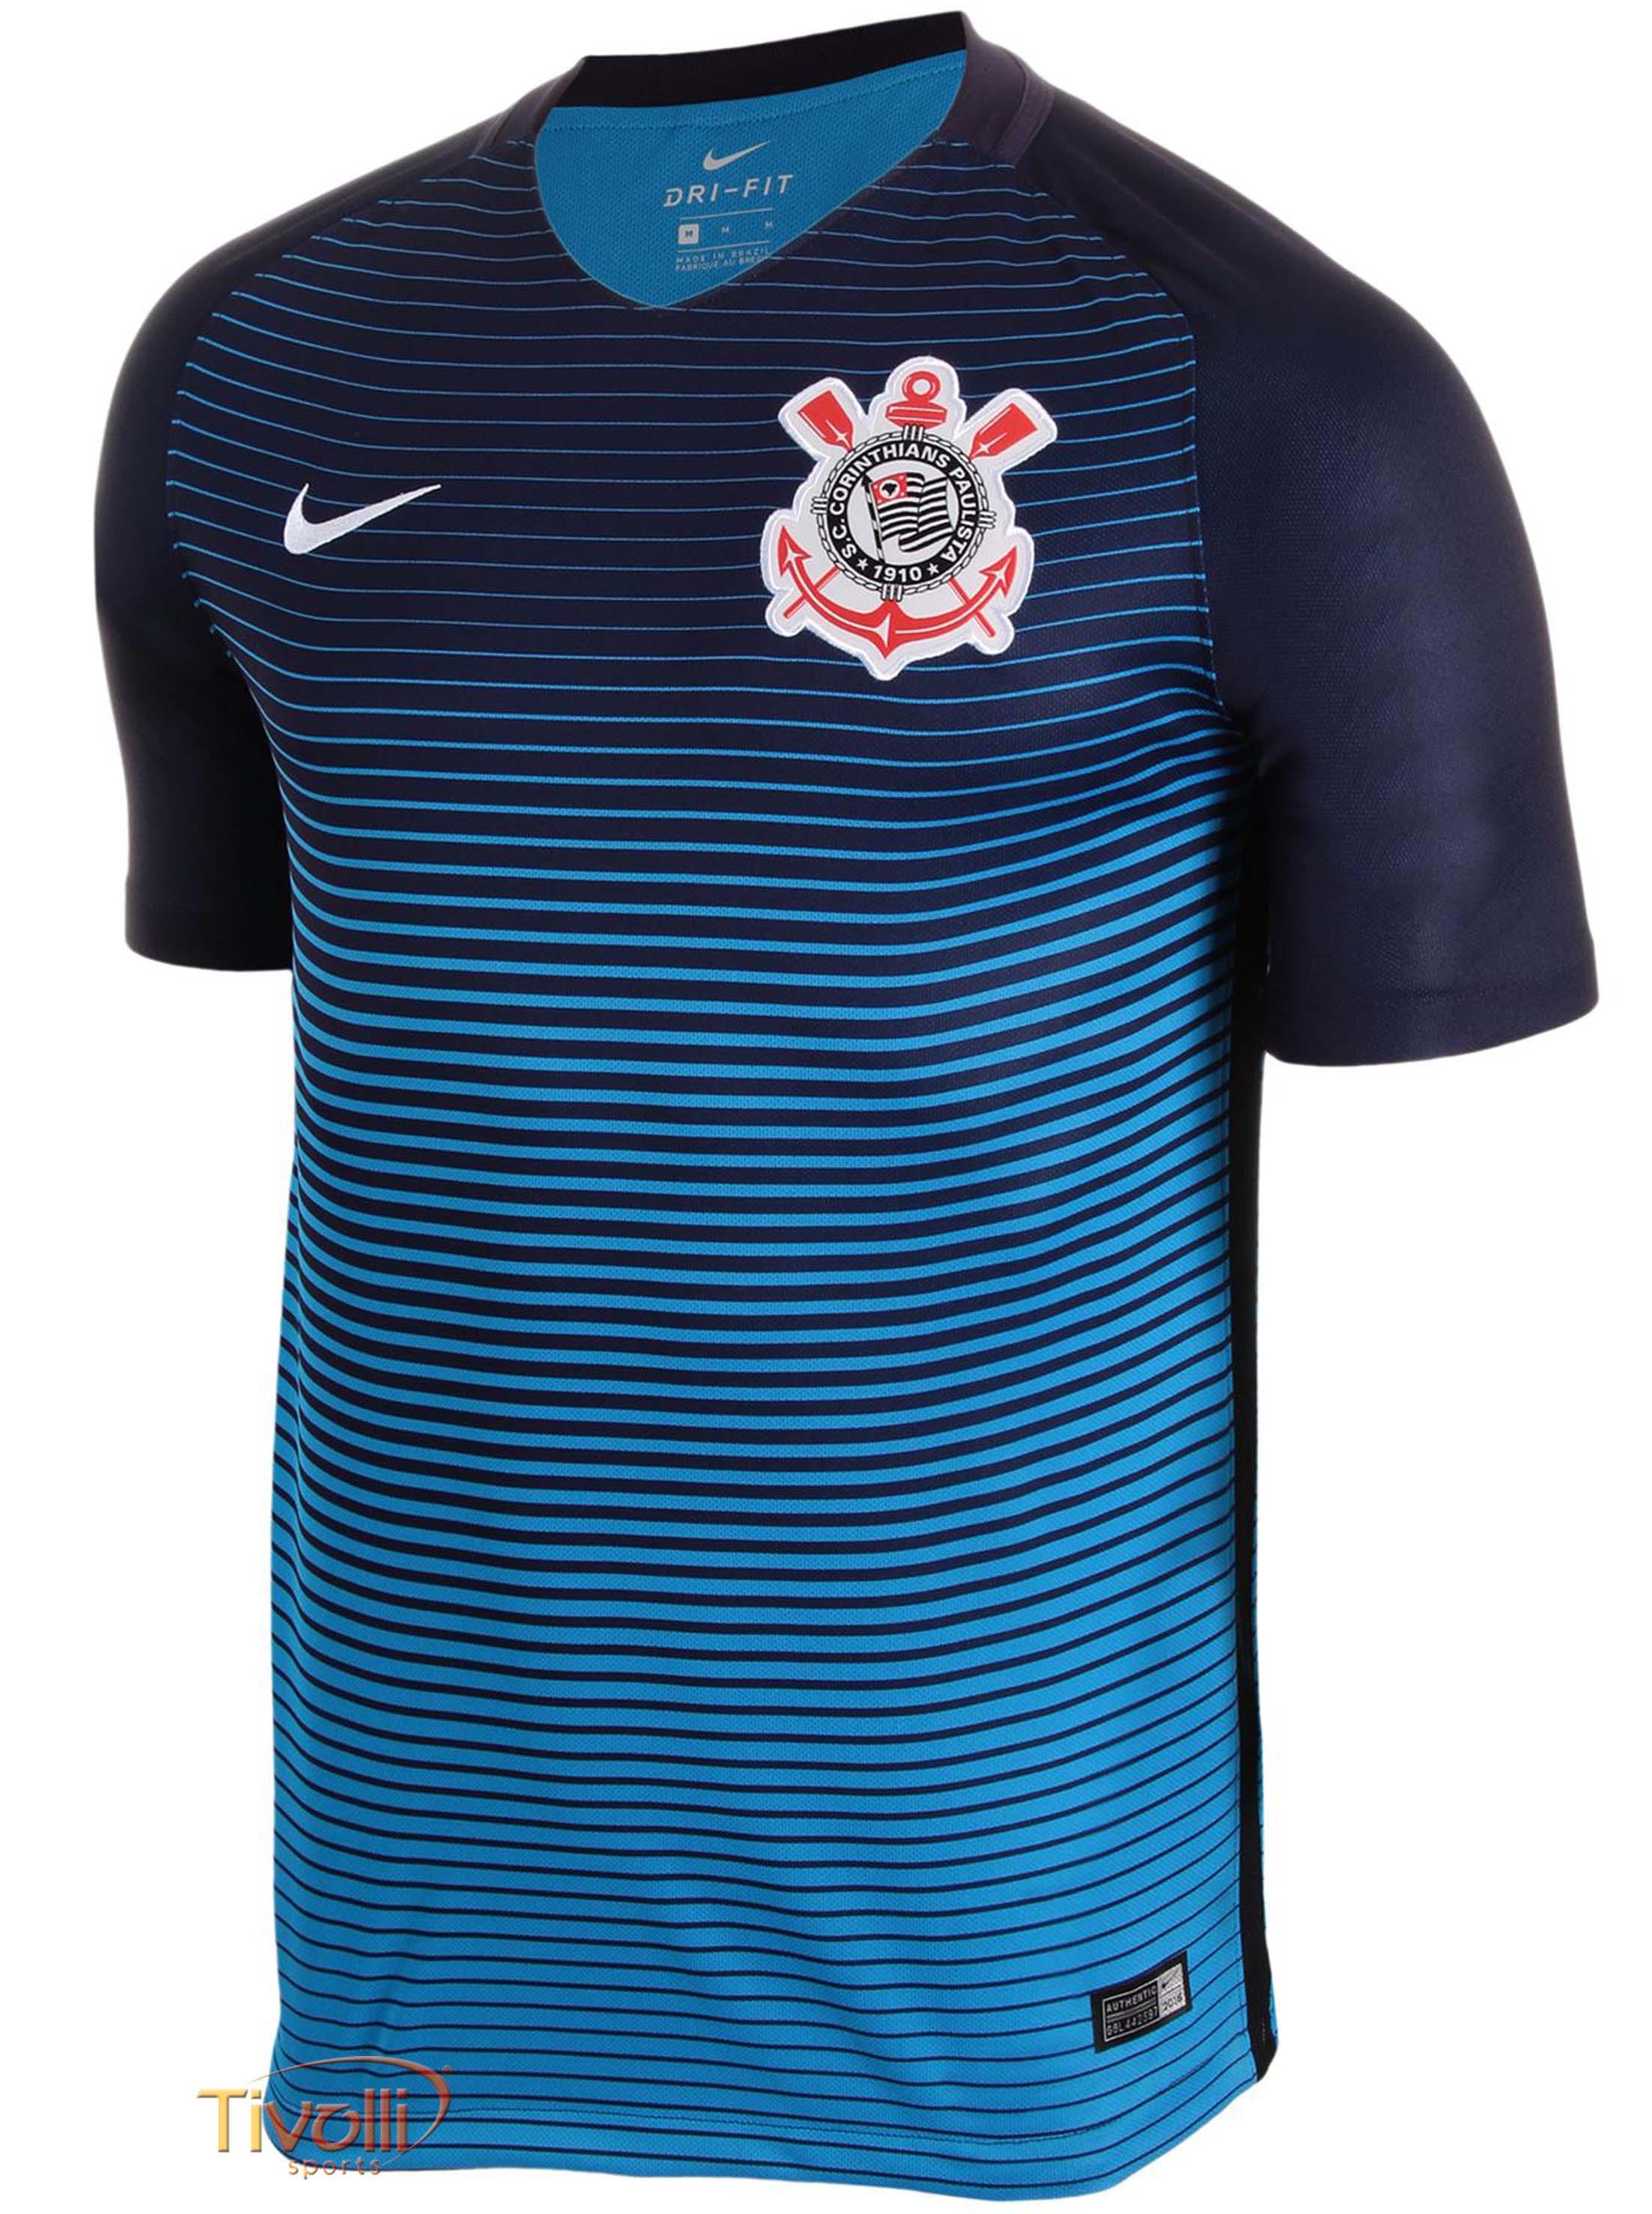 864a66c888 Camiseta Nike Corinthians III 2016 2017 Torcedor Juvenil   Azul